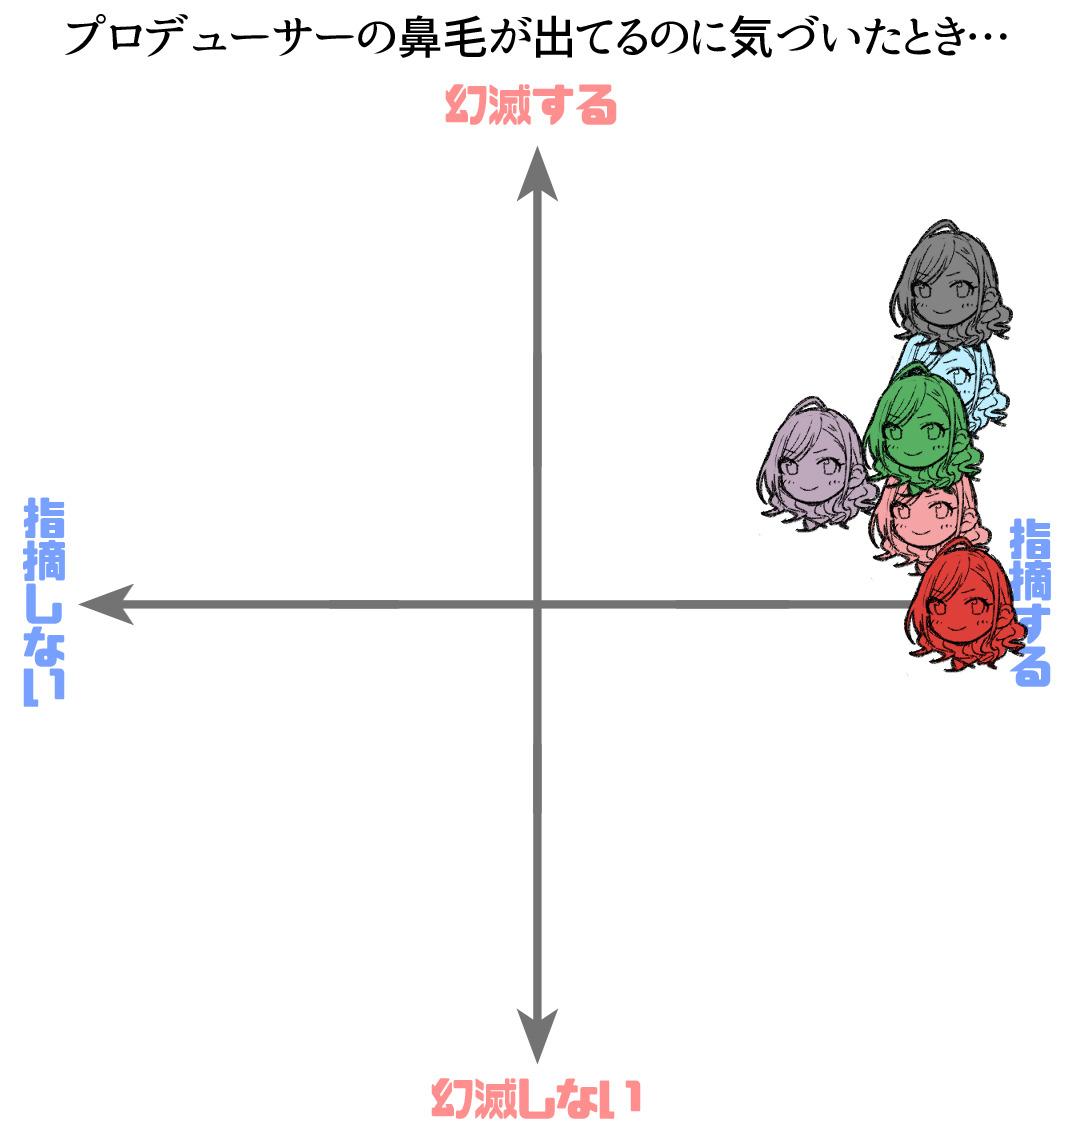 f:id:hoshi_sano:20200414113542j:image:w400